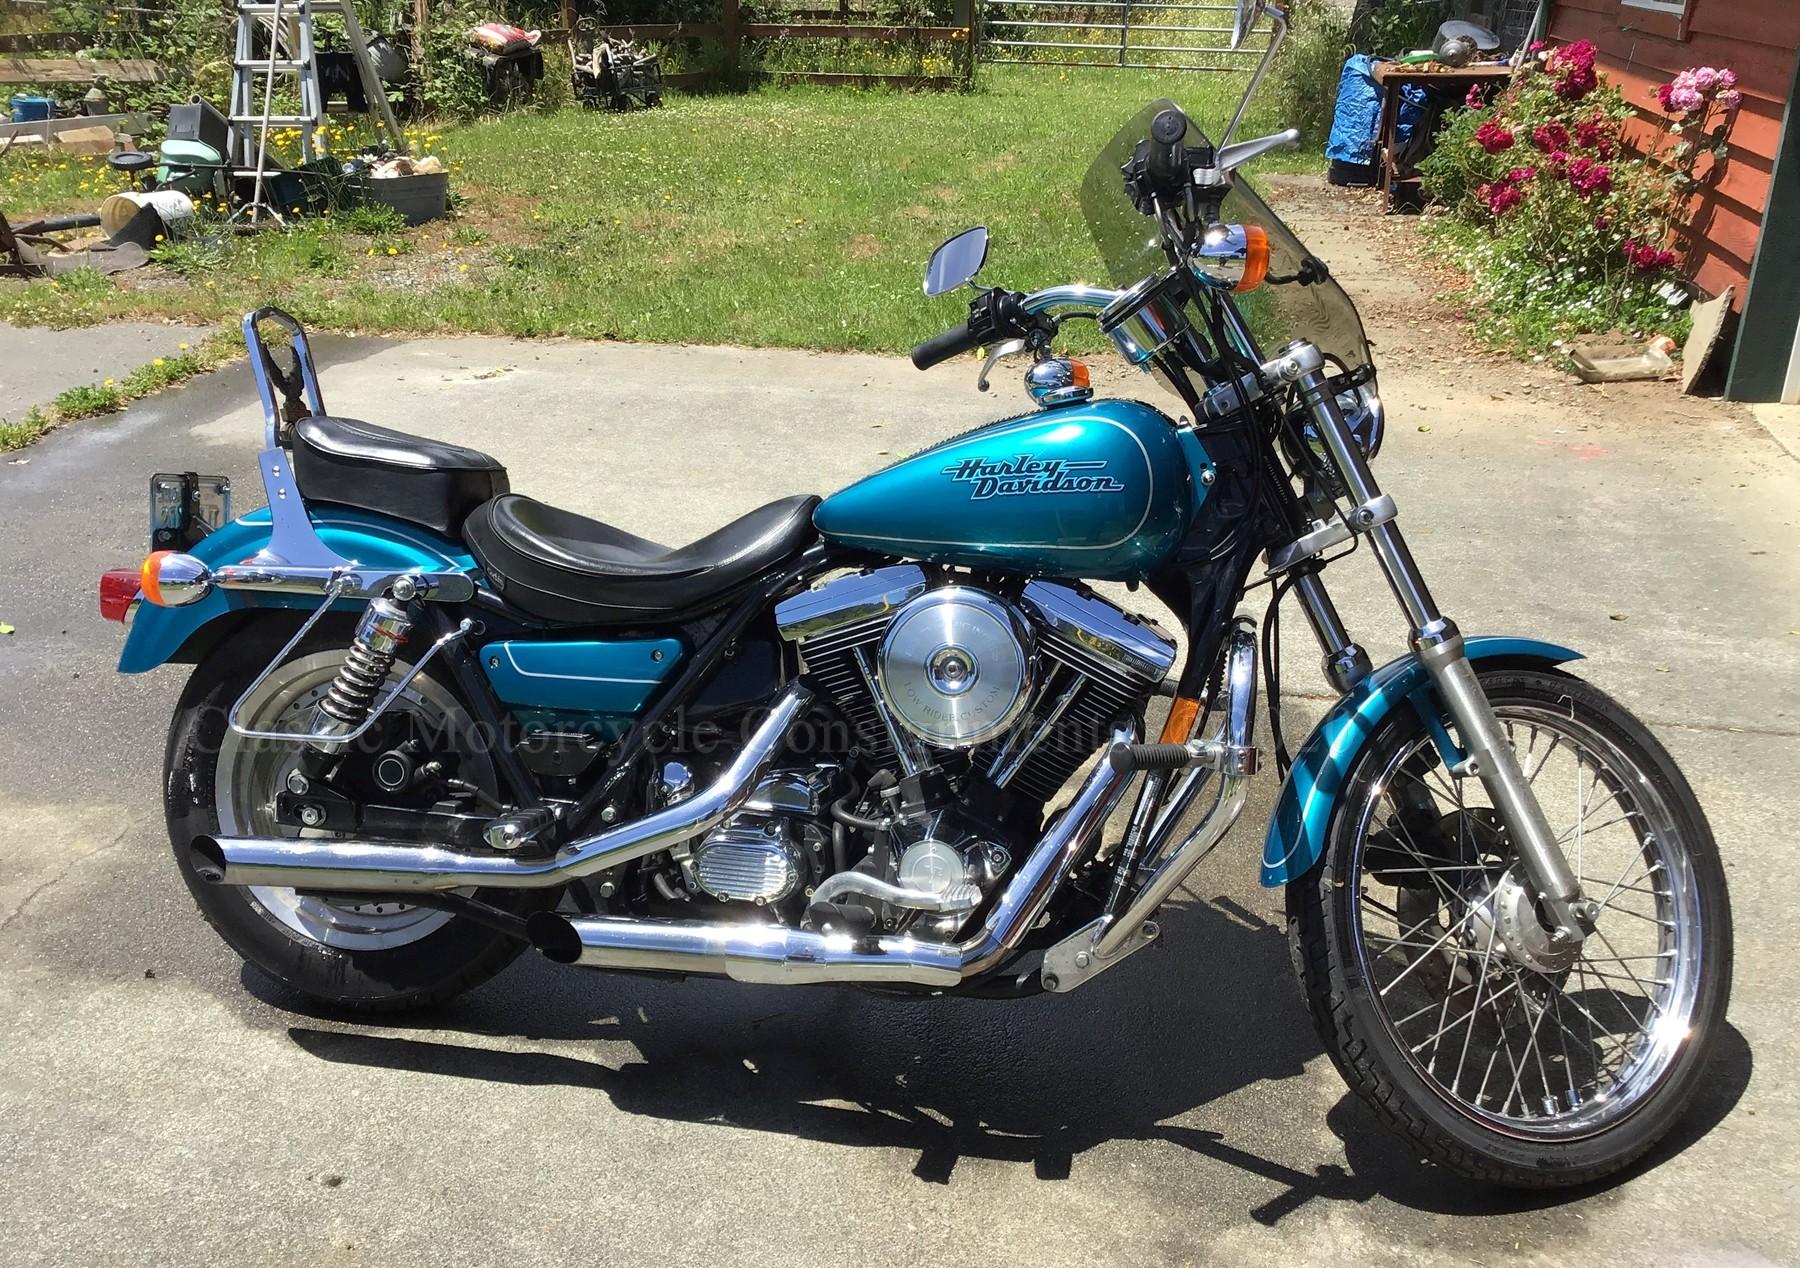 1994 Harley Davidson FXLRS Low Rider